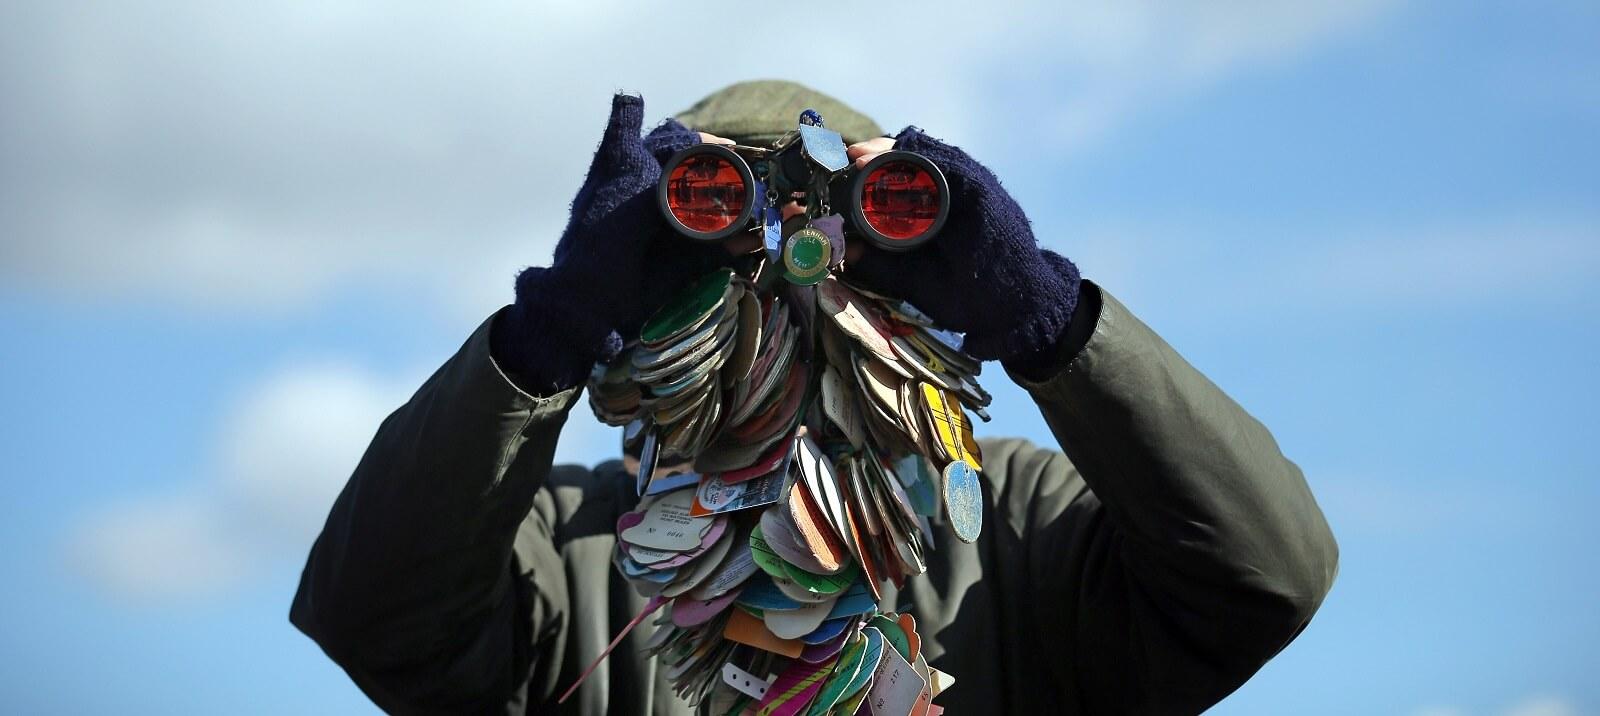 Cheltenham Festival 2013, England (Photo: Matt Cardy/Getty)